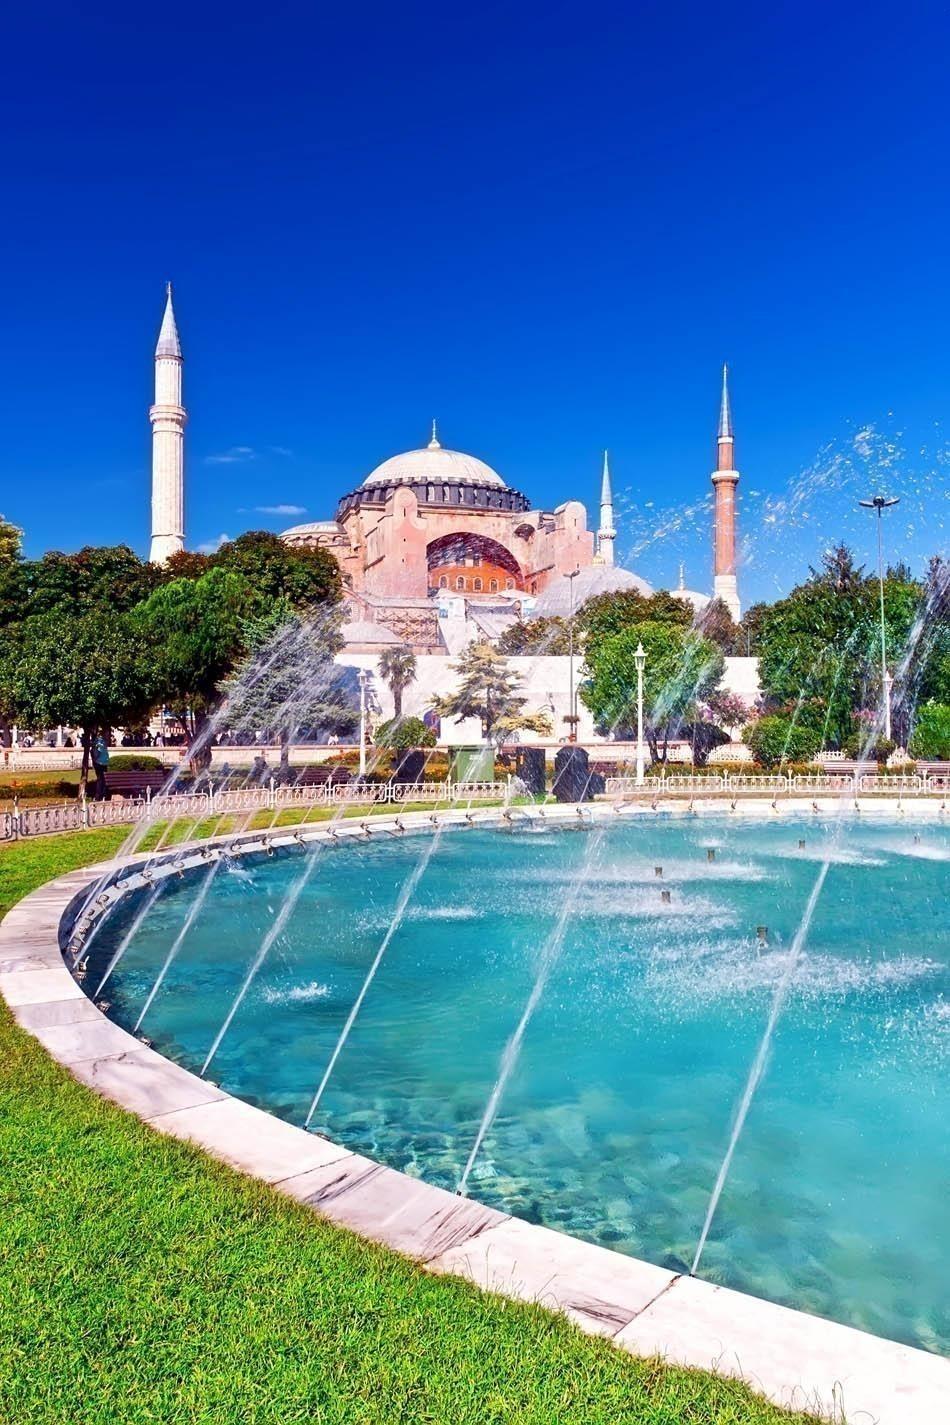 Beautiful View of Hagia Sophia in Istanbul, Turkey | Turkey Travel Guide